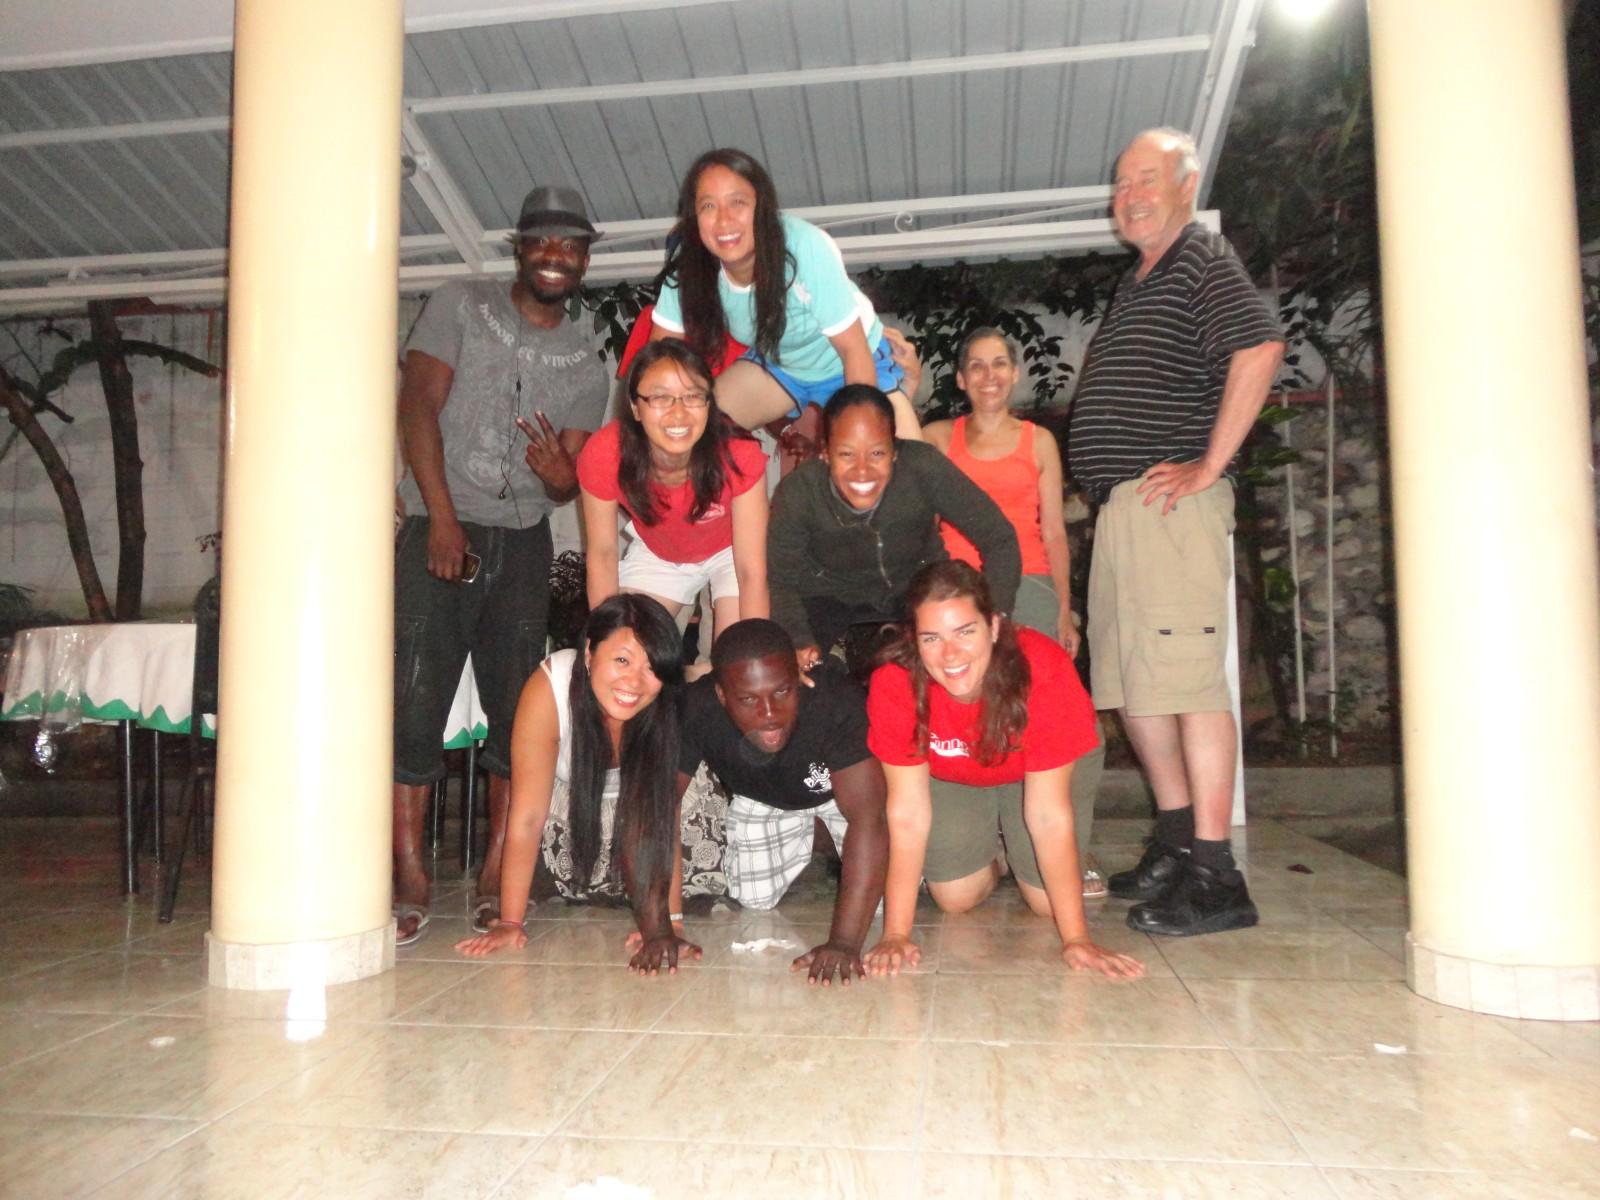 2013, Haiti, Cité Soleil, TWA, Third World Awareness, volunteers, friends, teamwork, charity, non-profit, helping, giving